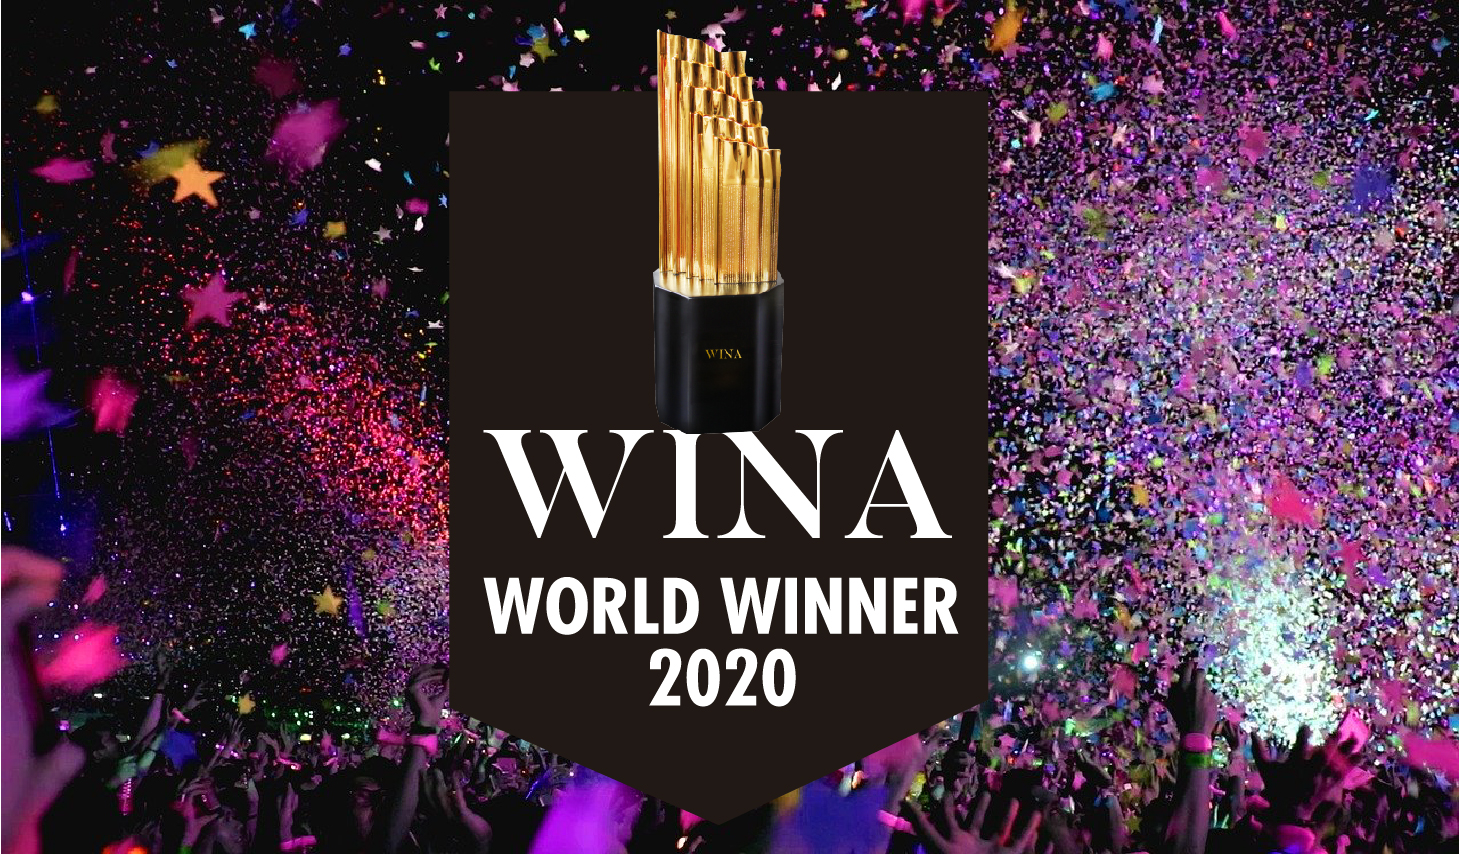 La Machi, ganadora de los Premio WINA 2020